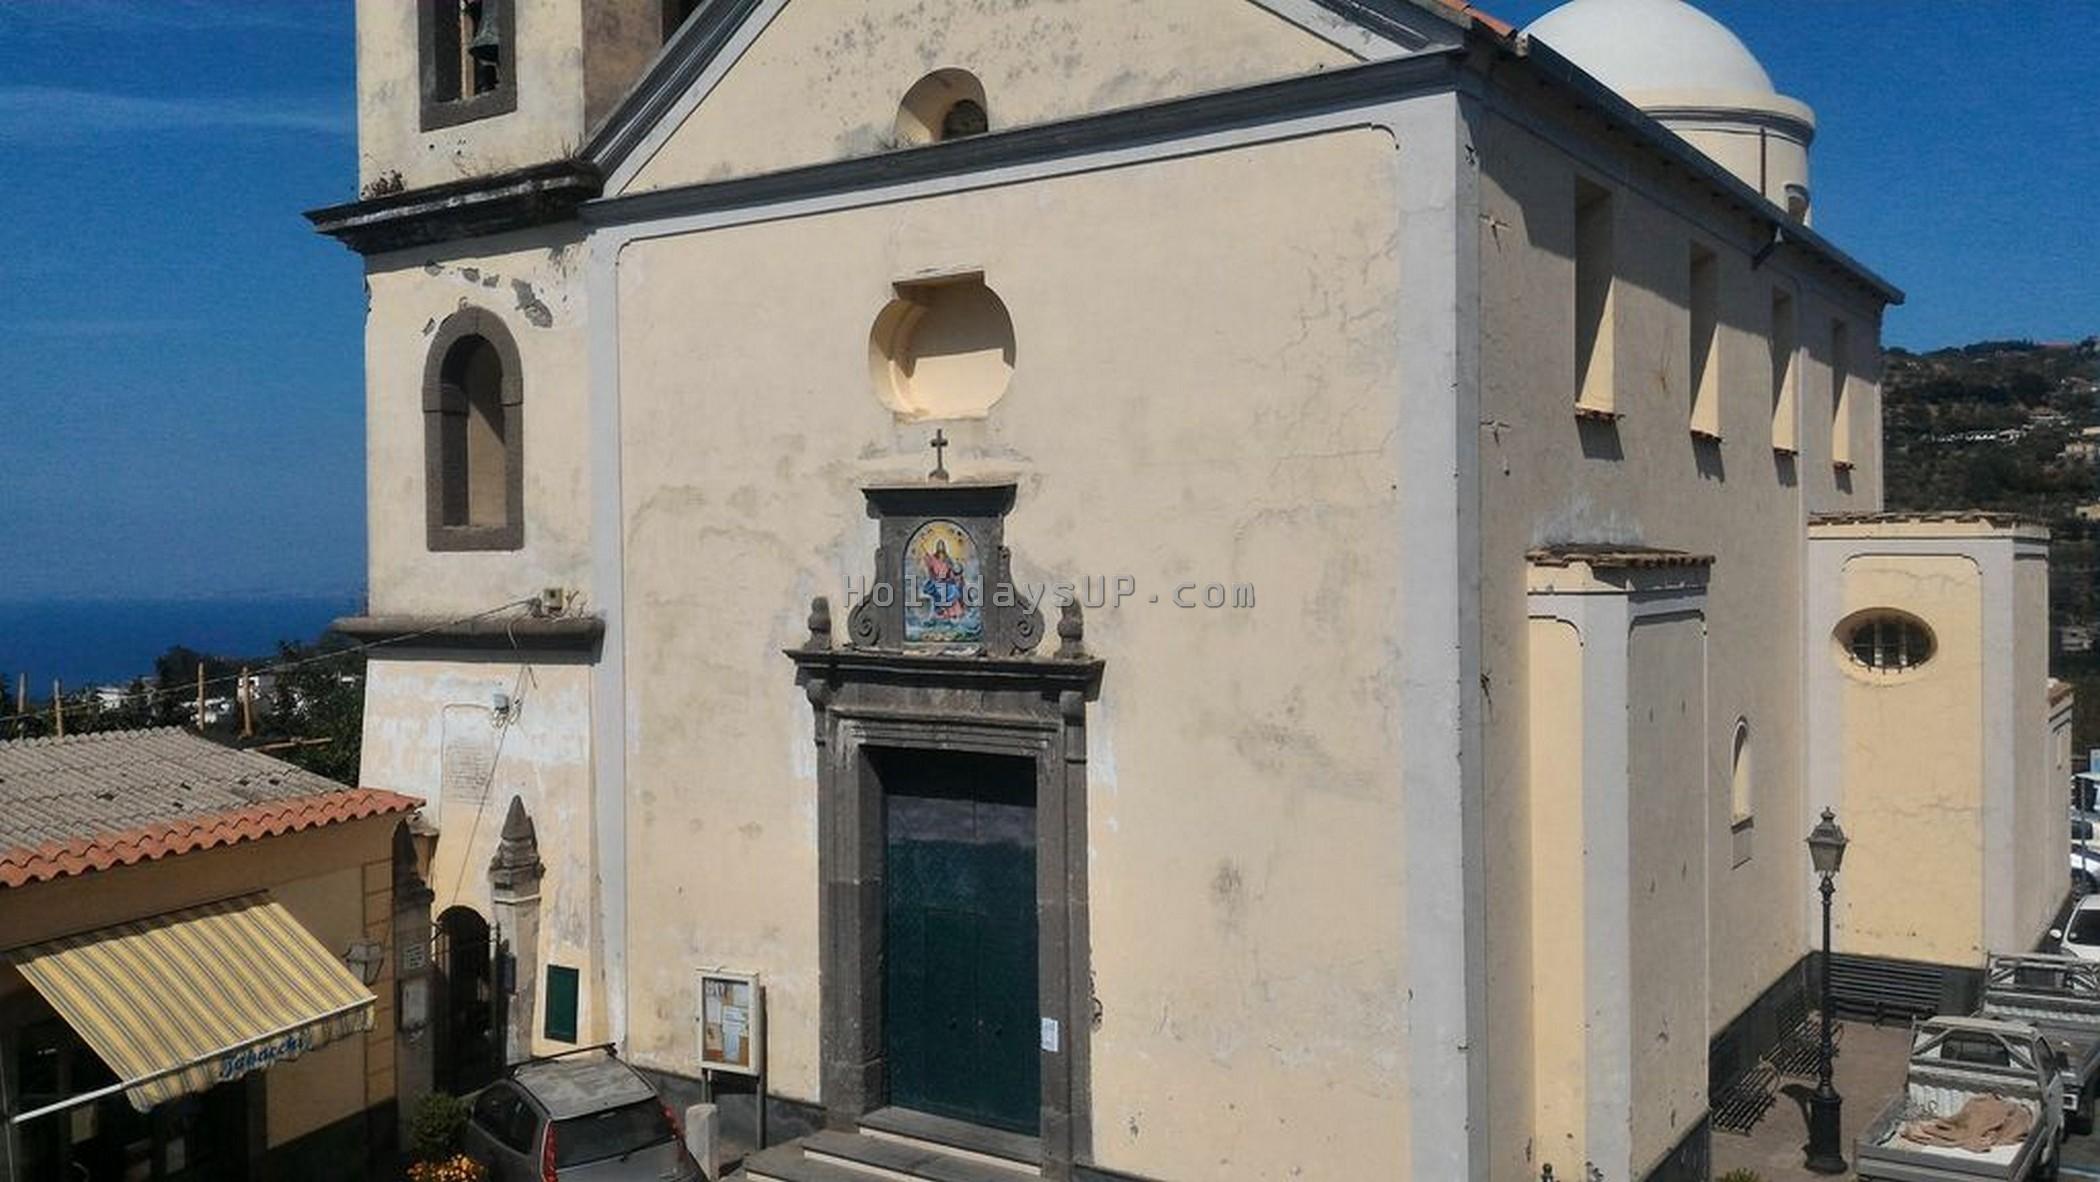 SS. Salvatore Church - Schiazzano